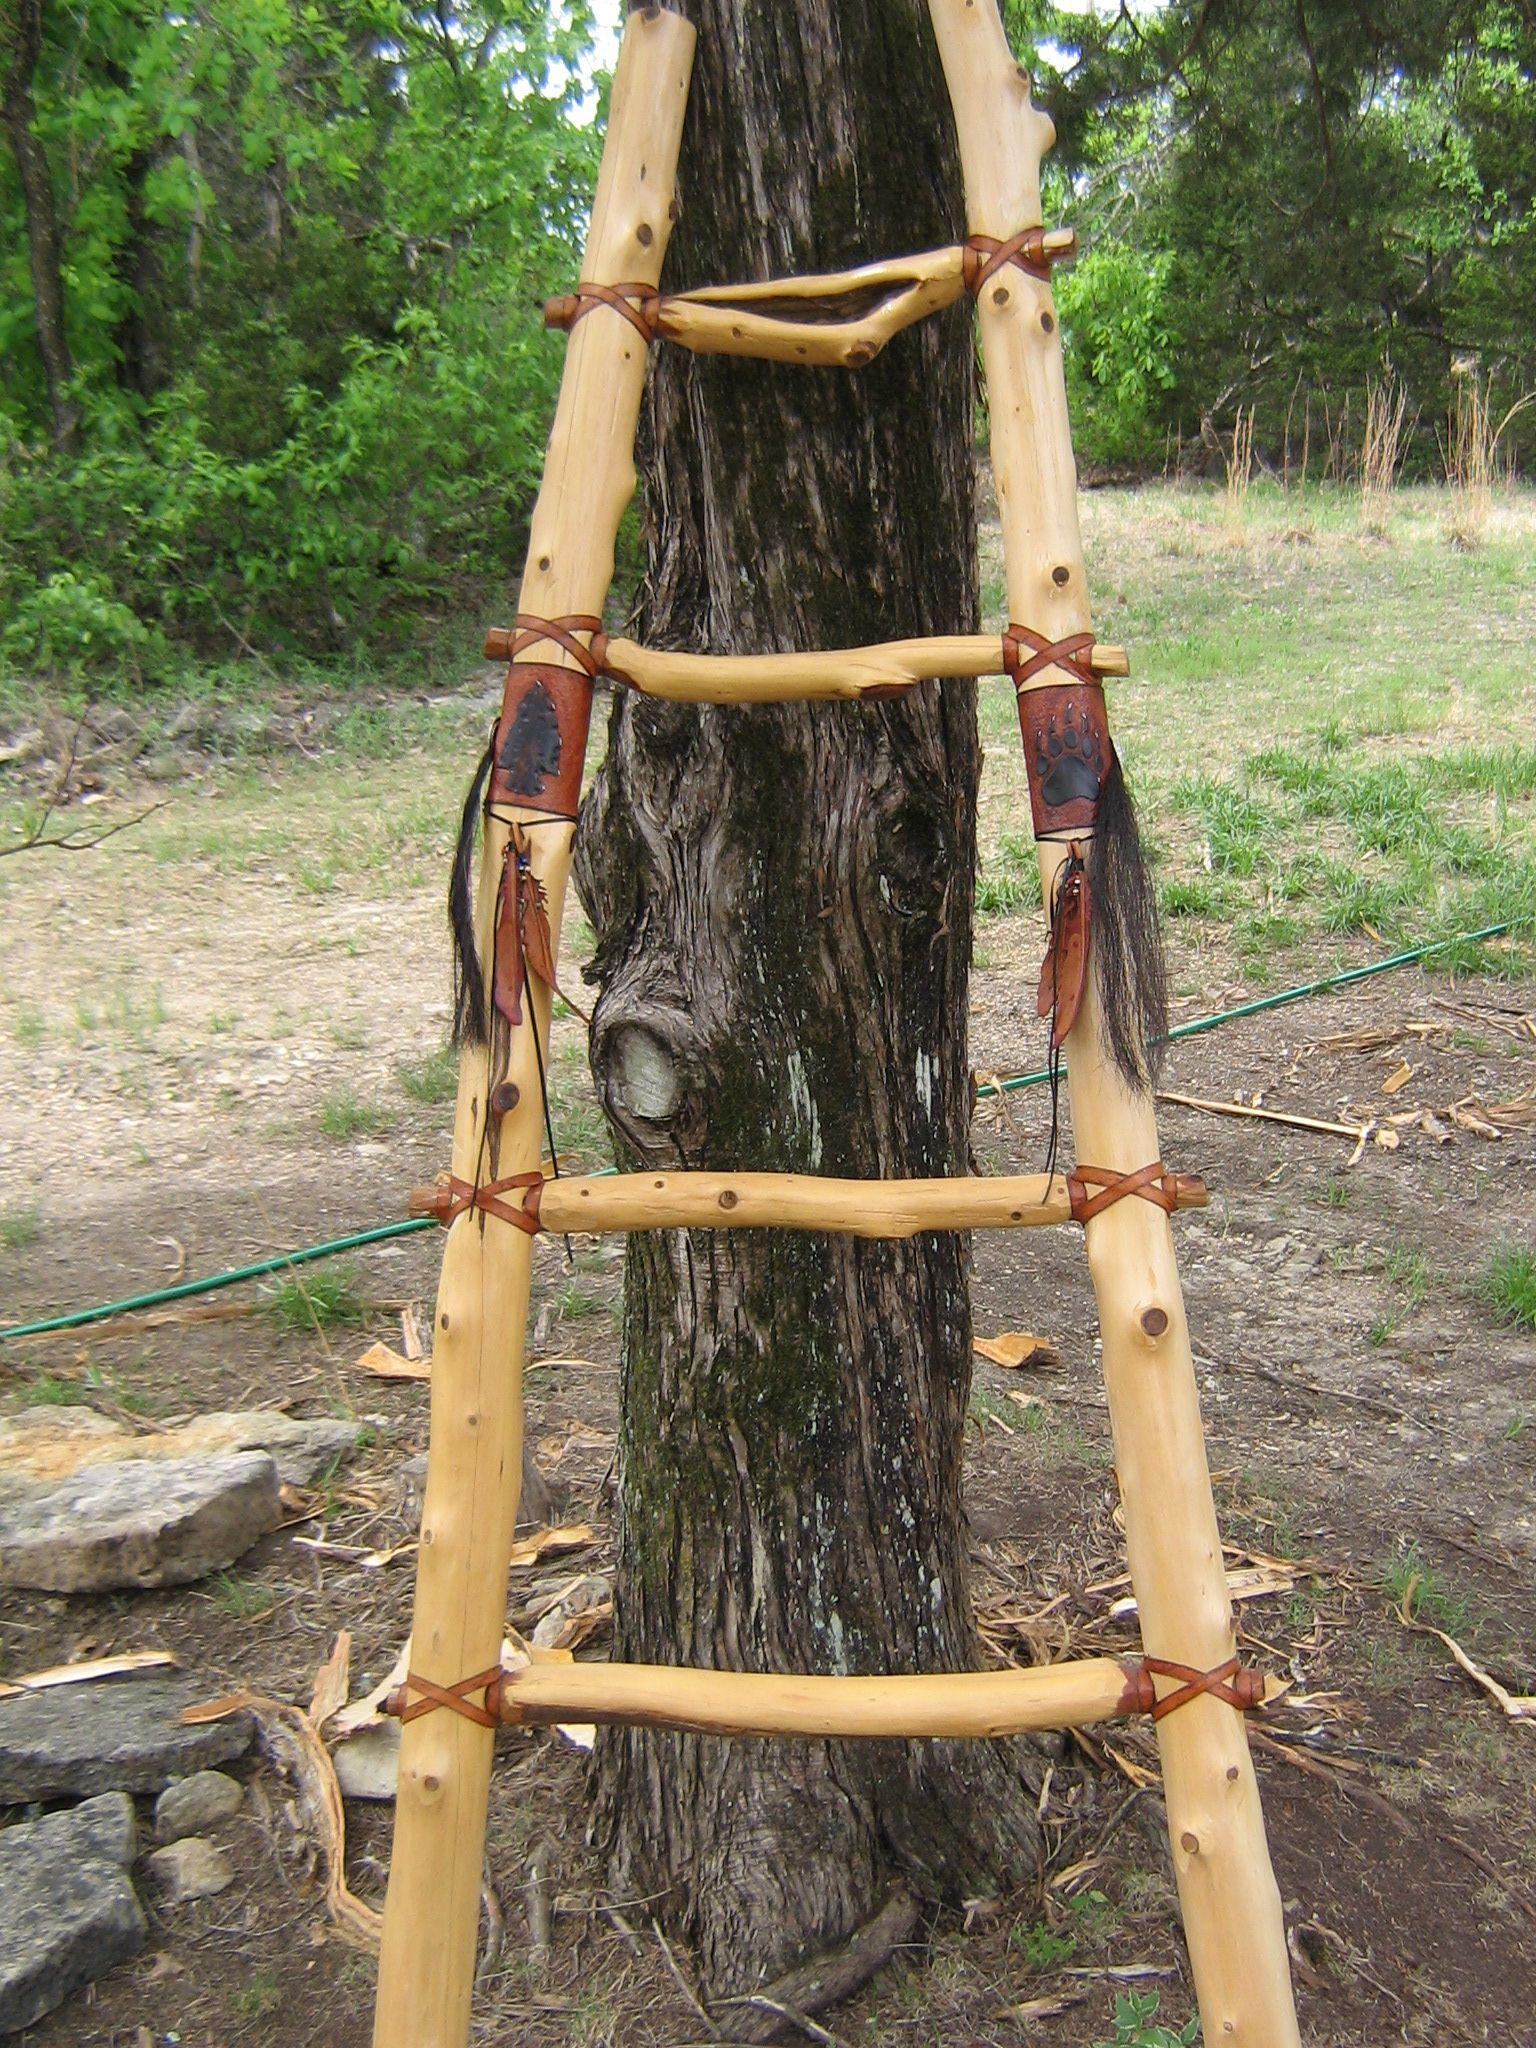 an anasazi kiva u2013 a sweat lodge where they held spiritual